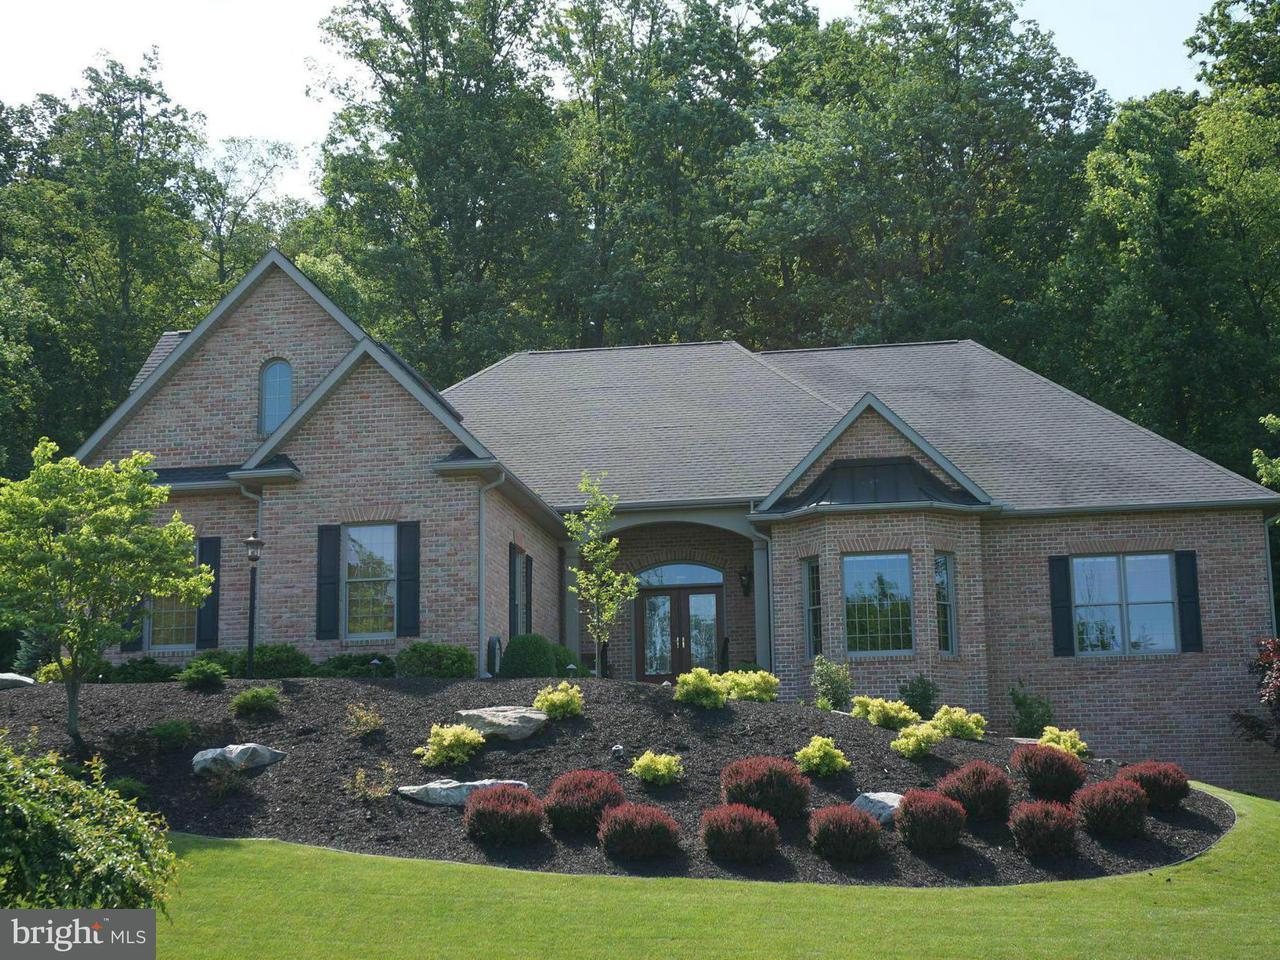 Single Family Home for Sale at 11439 WEATHERSTONE Drive 11439 WEATHERSTONE Drive Waynesboro, Pennsylvania 17268 United States